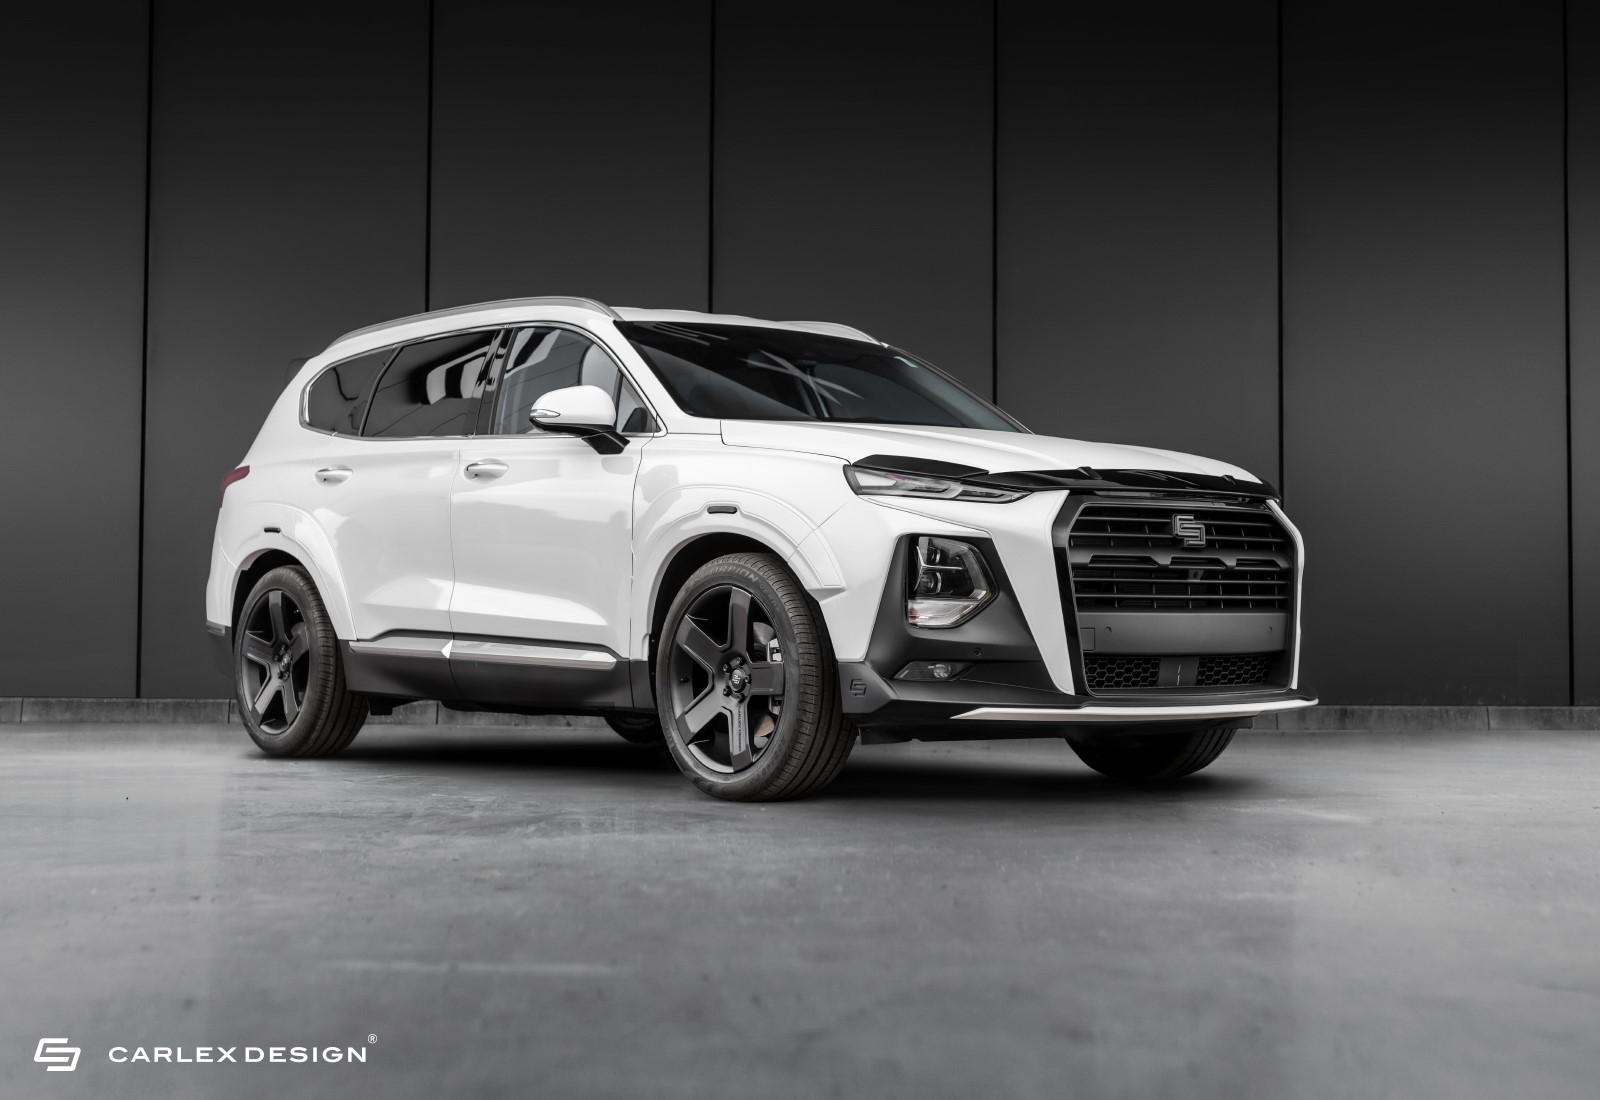 Hyundai-Santa-Fe-by-Carlex-Design-10